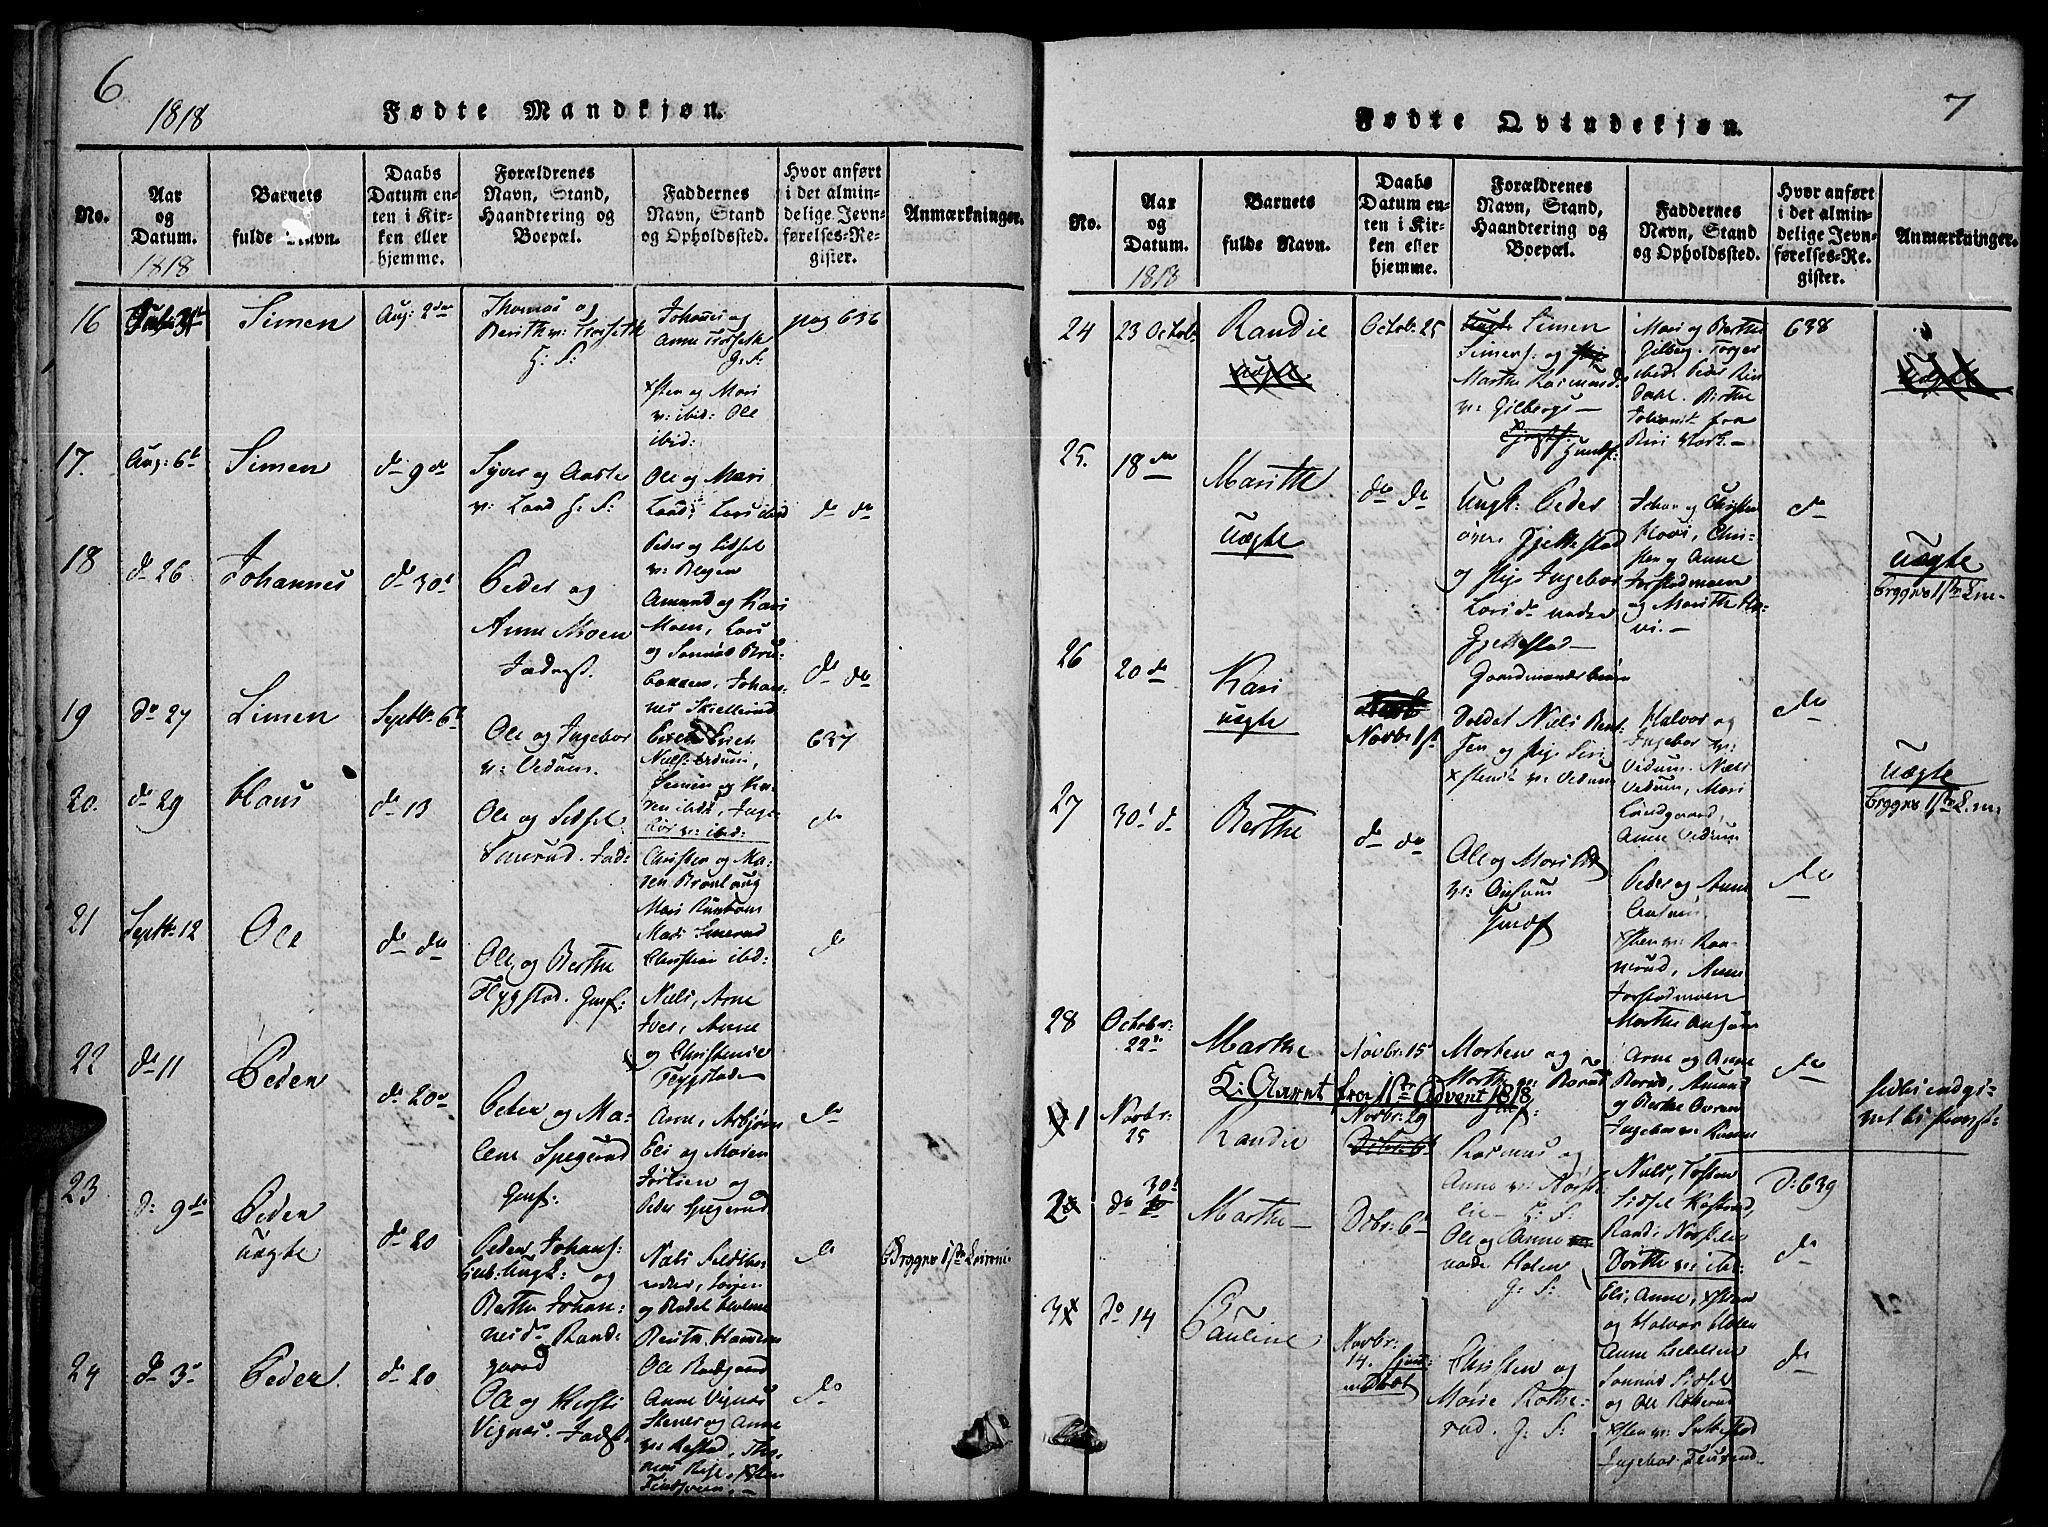 SAH, Fåberg prestekontor, Ministerialbok nr. 3, 1818-1833, s. 6-7